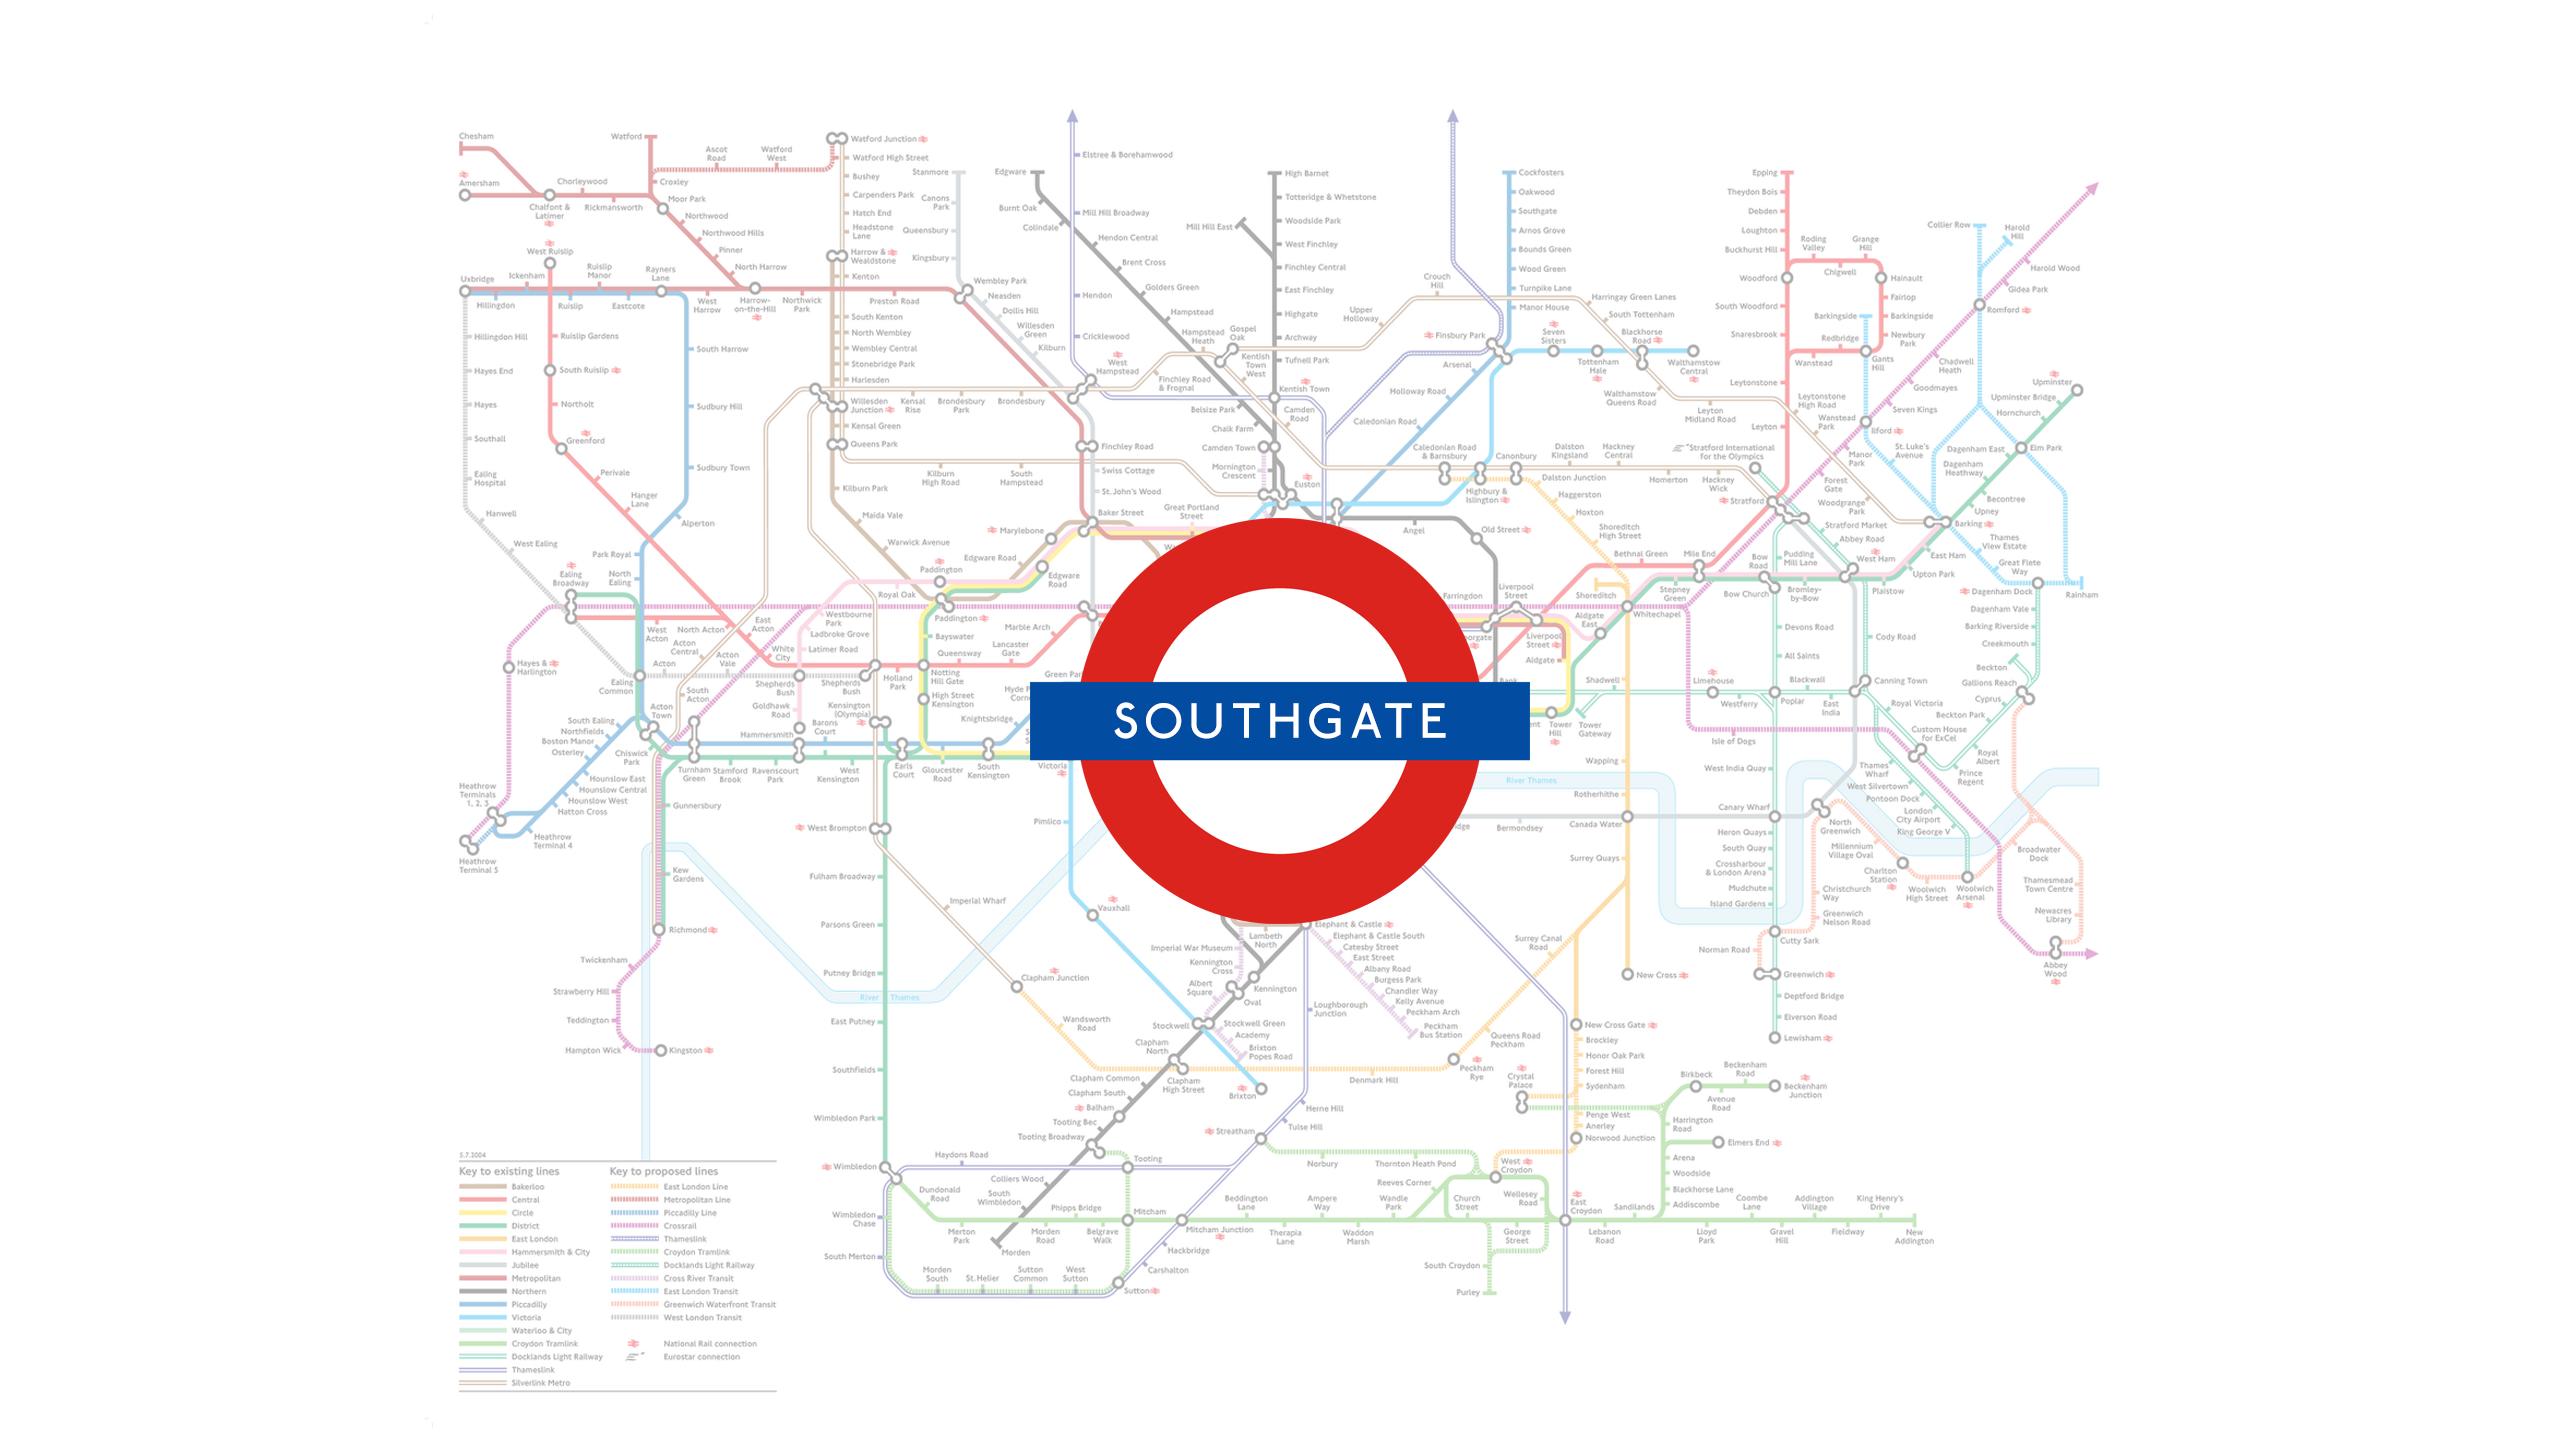 Southgate (Map)